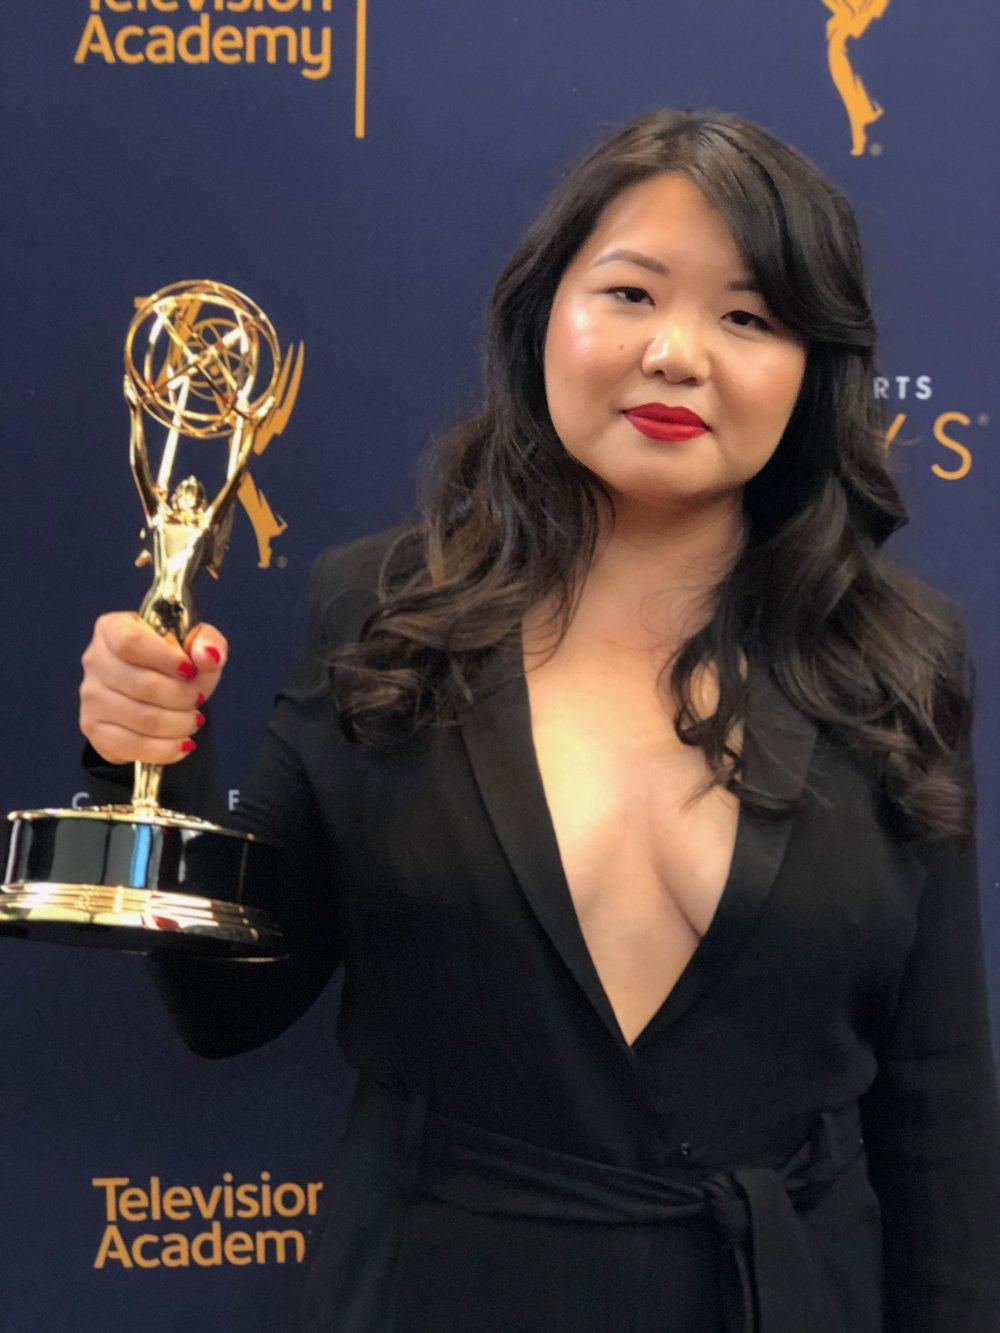 "Jessica Gao - Jessica Gao,Base在洛杉矶的编剧。她出生在北京,在洛杉矶郊区的圣盖博谷长大。她曾为Rick&Morty, Silicon Valley, Corporate和Robot Chicken编剧。她与丹·哈蒙共同撰写""Whiting Wongs""的博客,这是一个关于种族和写作的博客。她最近因""Pickle Rick""(Rick&Morty)获得艾美奖。"